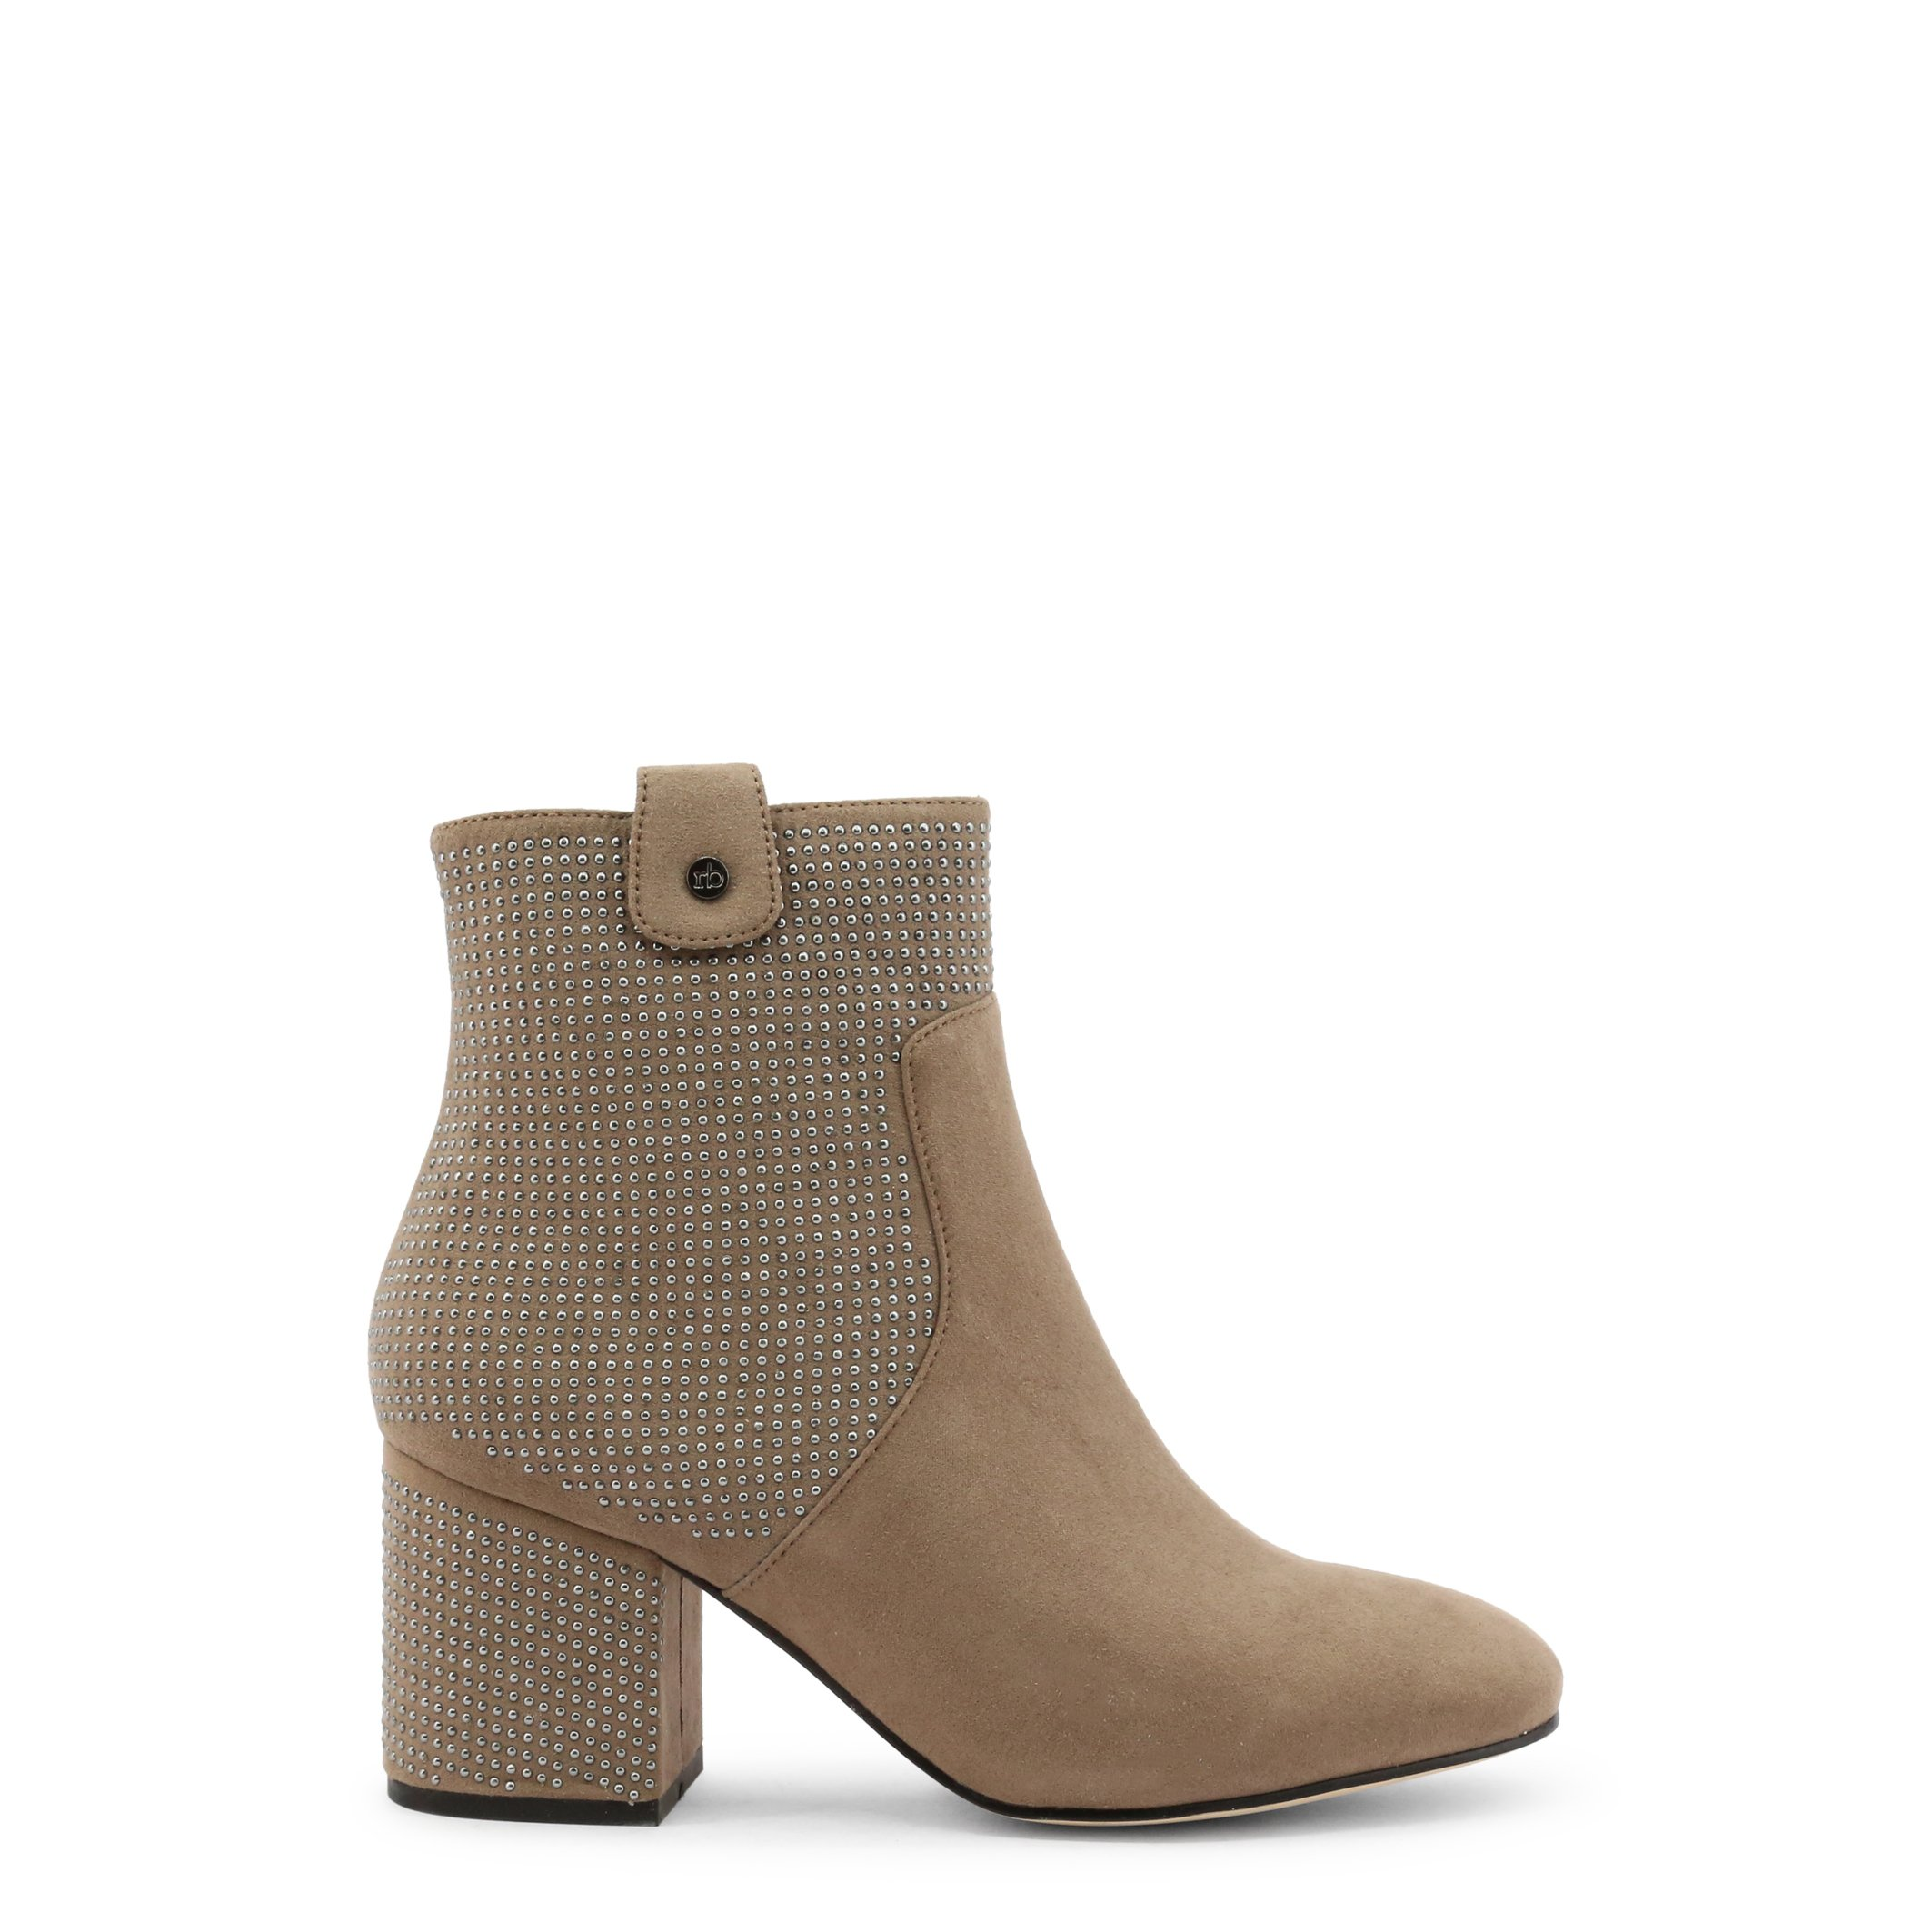 Roccobarocco Women's Ankle Boot Black RBSC1JT01STD - brown EU 37